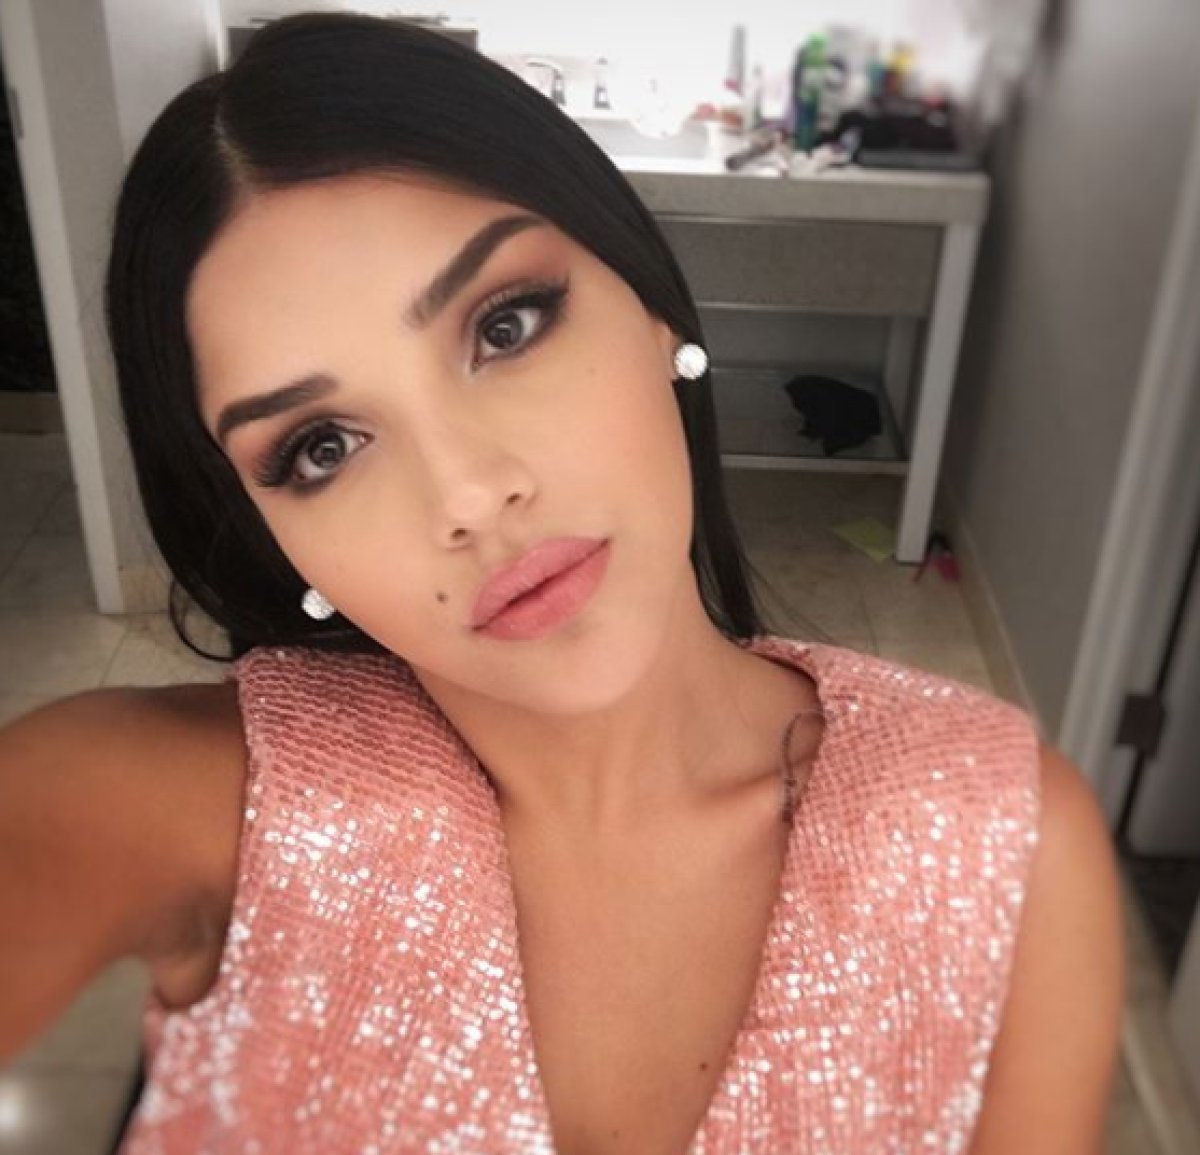 Así luce Laura González, virreina universal, sin una gota de maquillaje